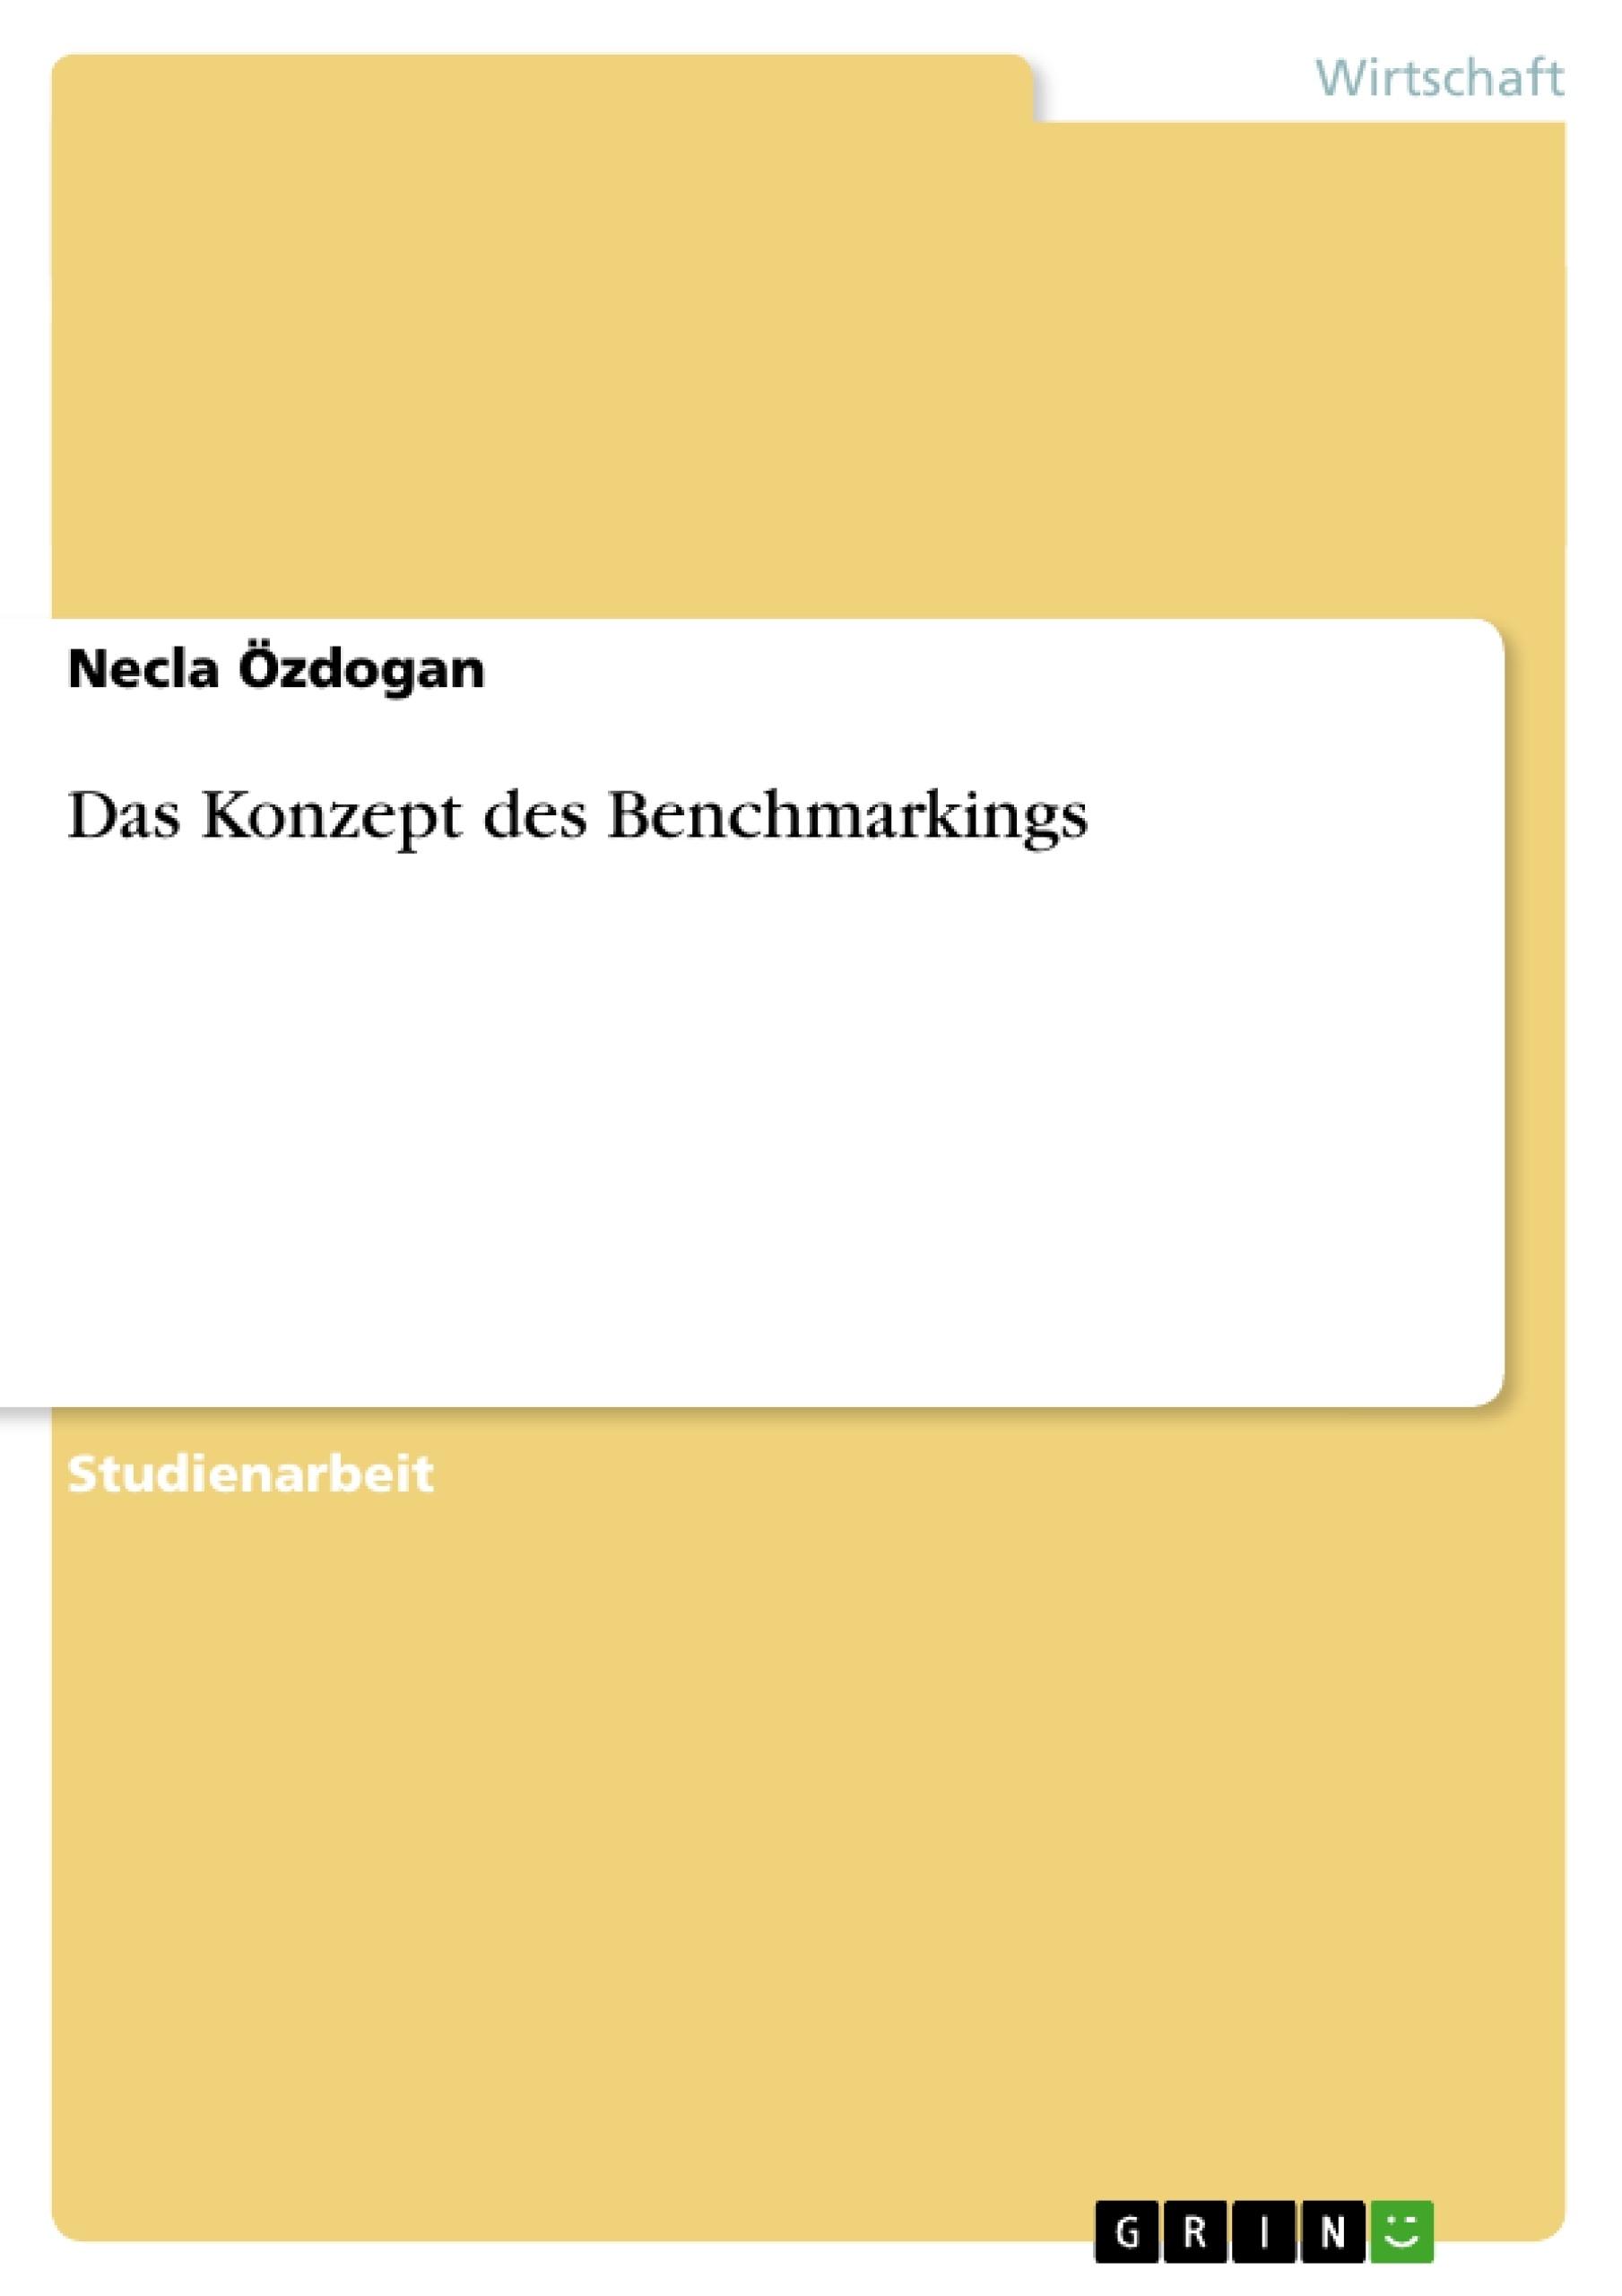 Titel: Das Konzept des Benchmarkings